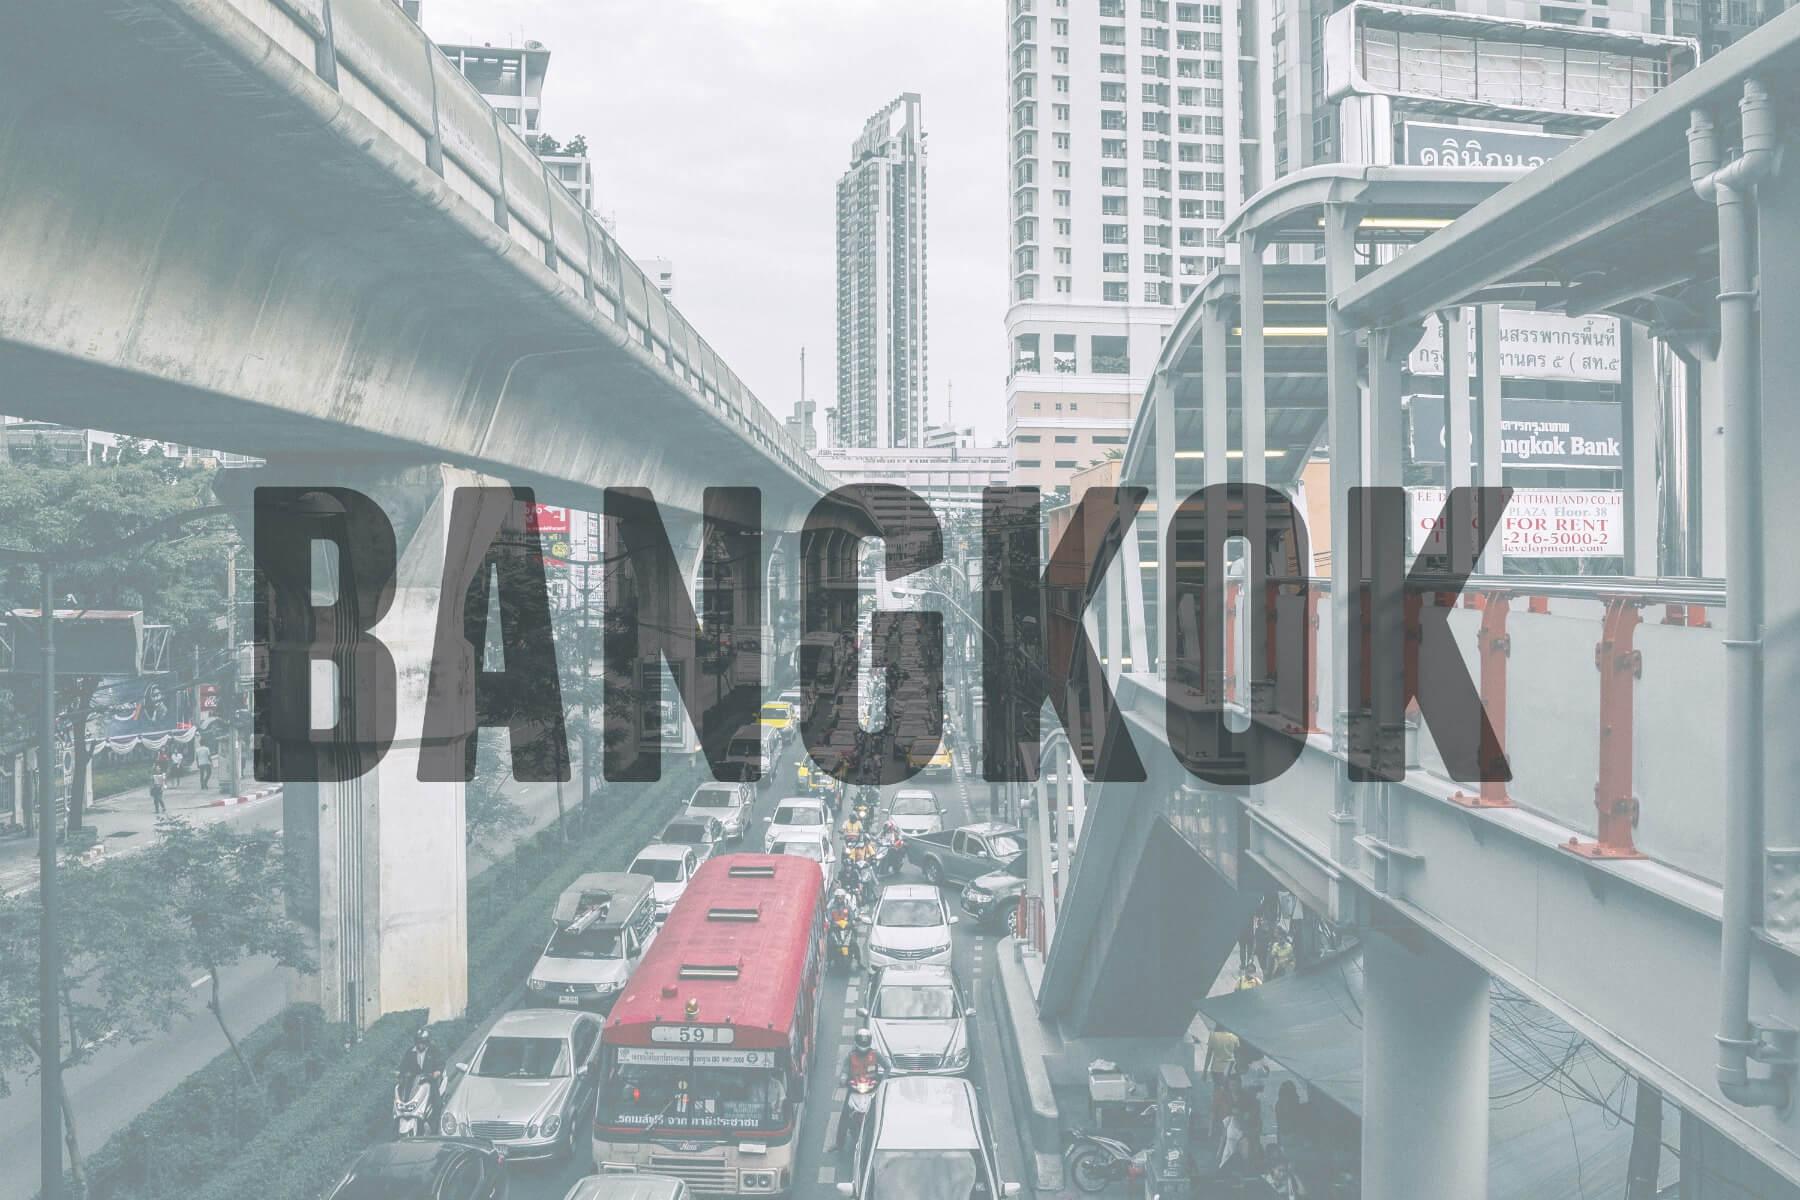 'BANGKOK' (City bridge and cars)